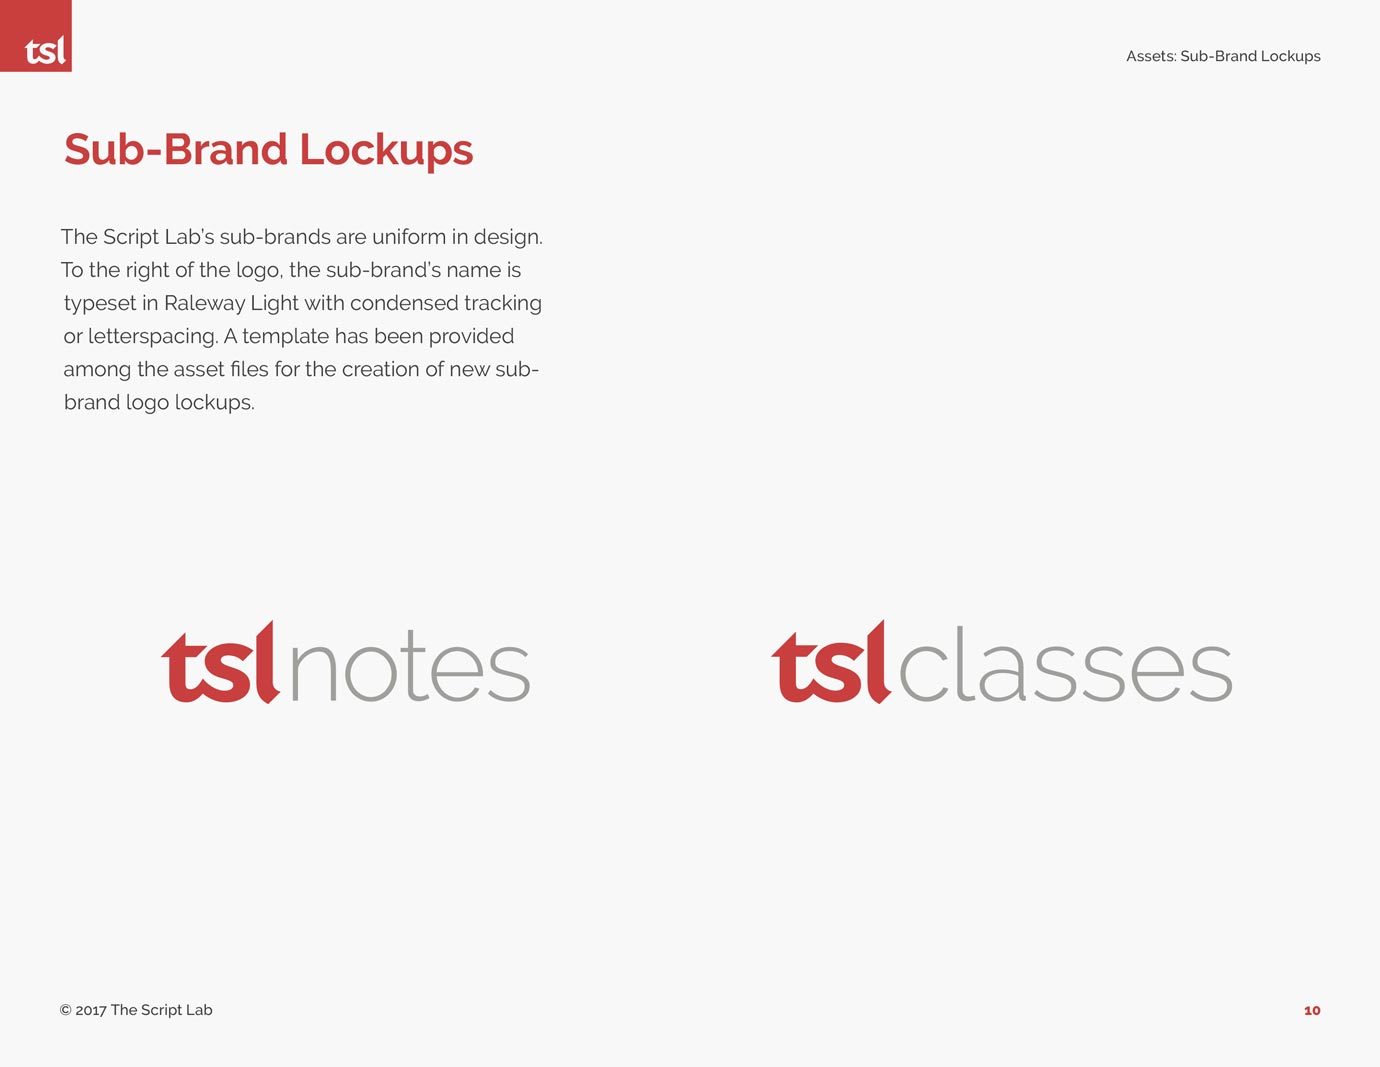 The Script Lab secondary logo designs